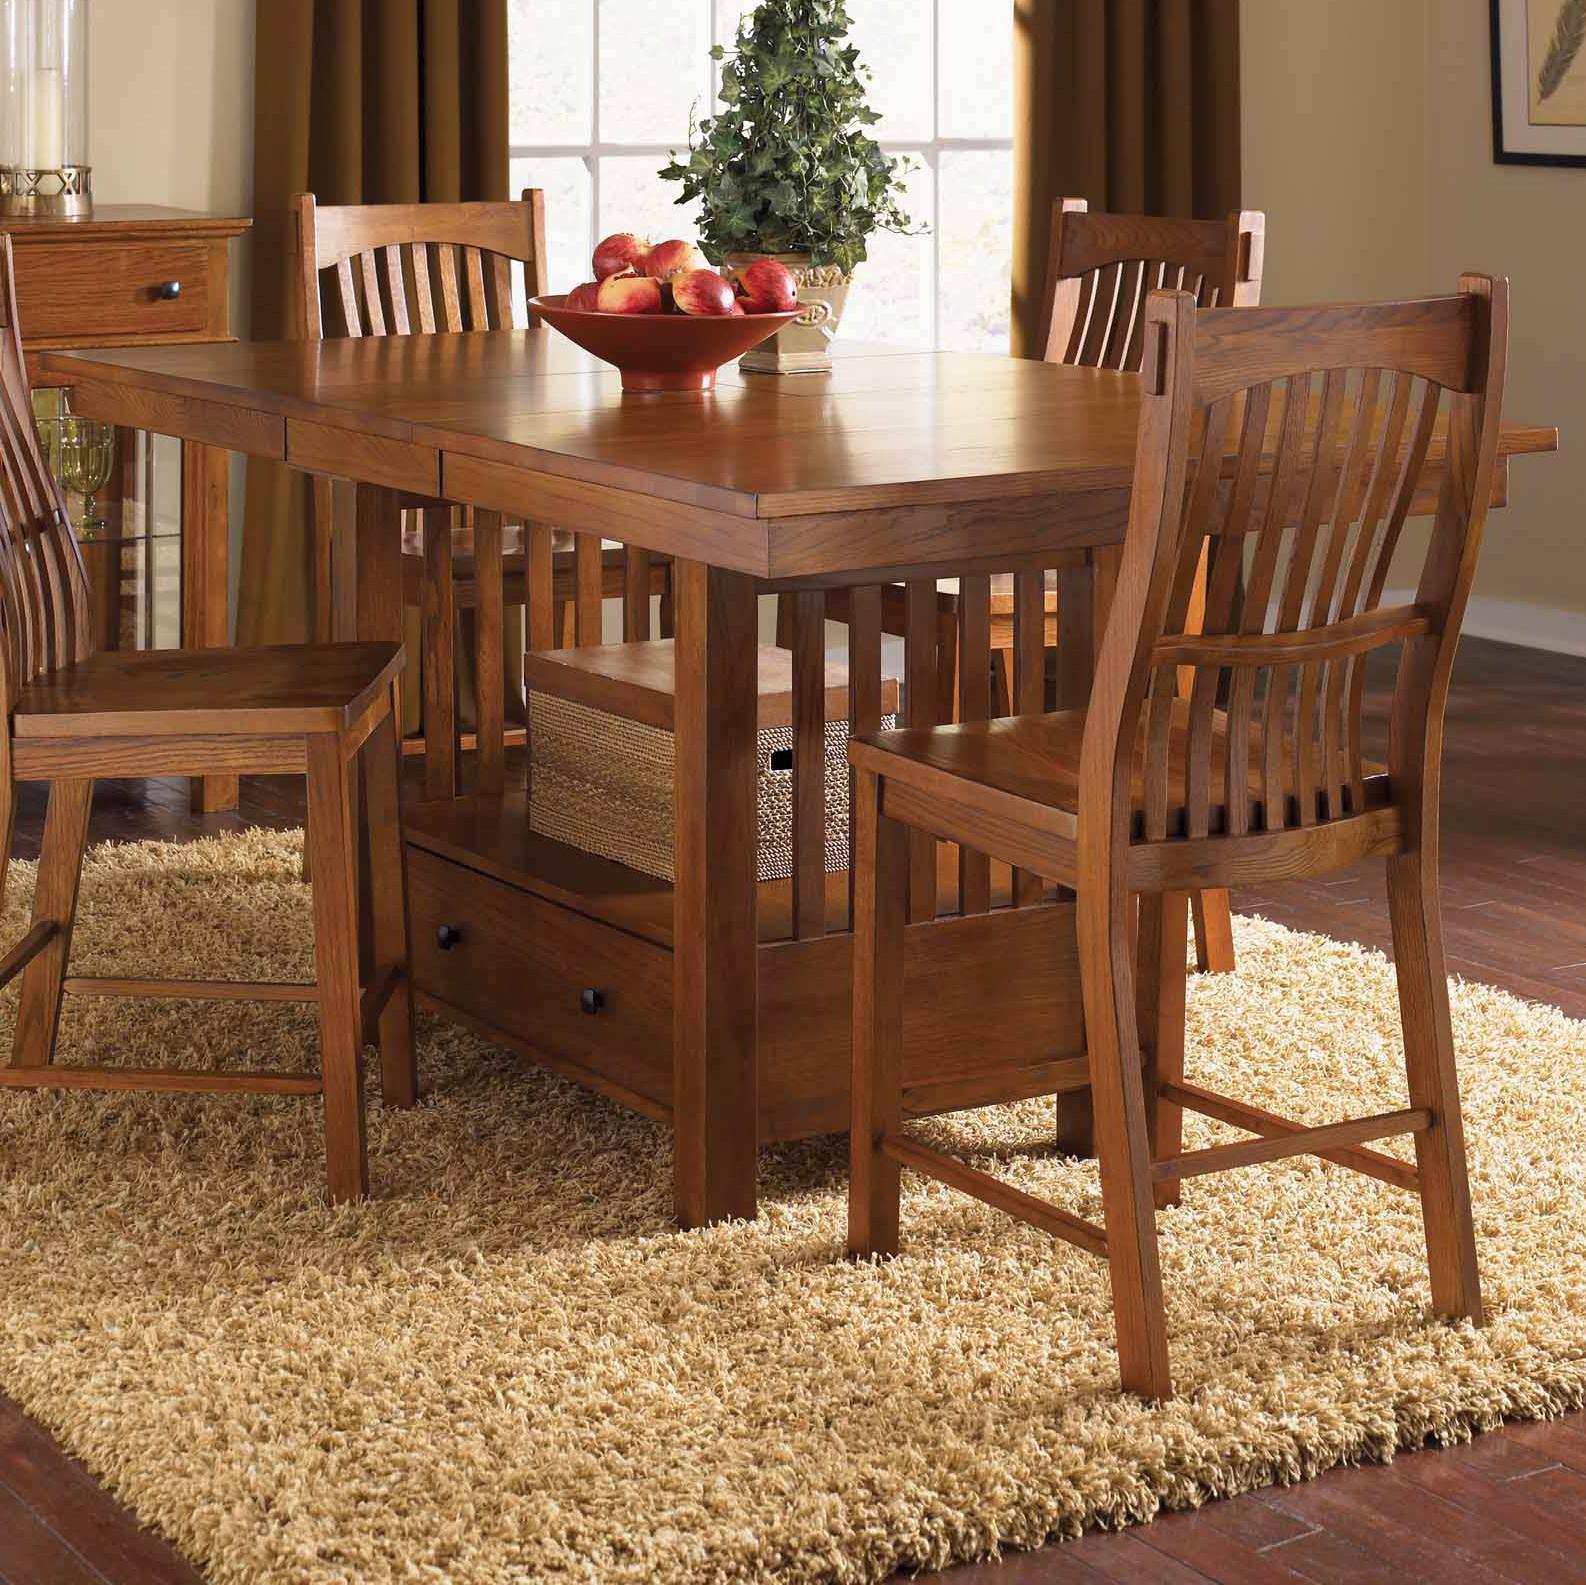 "Laurelhurst 42"" x 56"" Rectangular Gathering Table by A-A at Walker's Furniture"